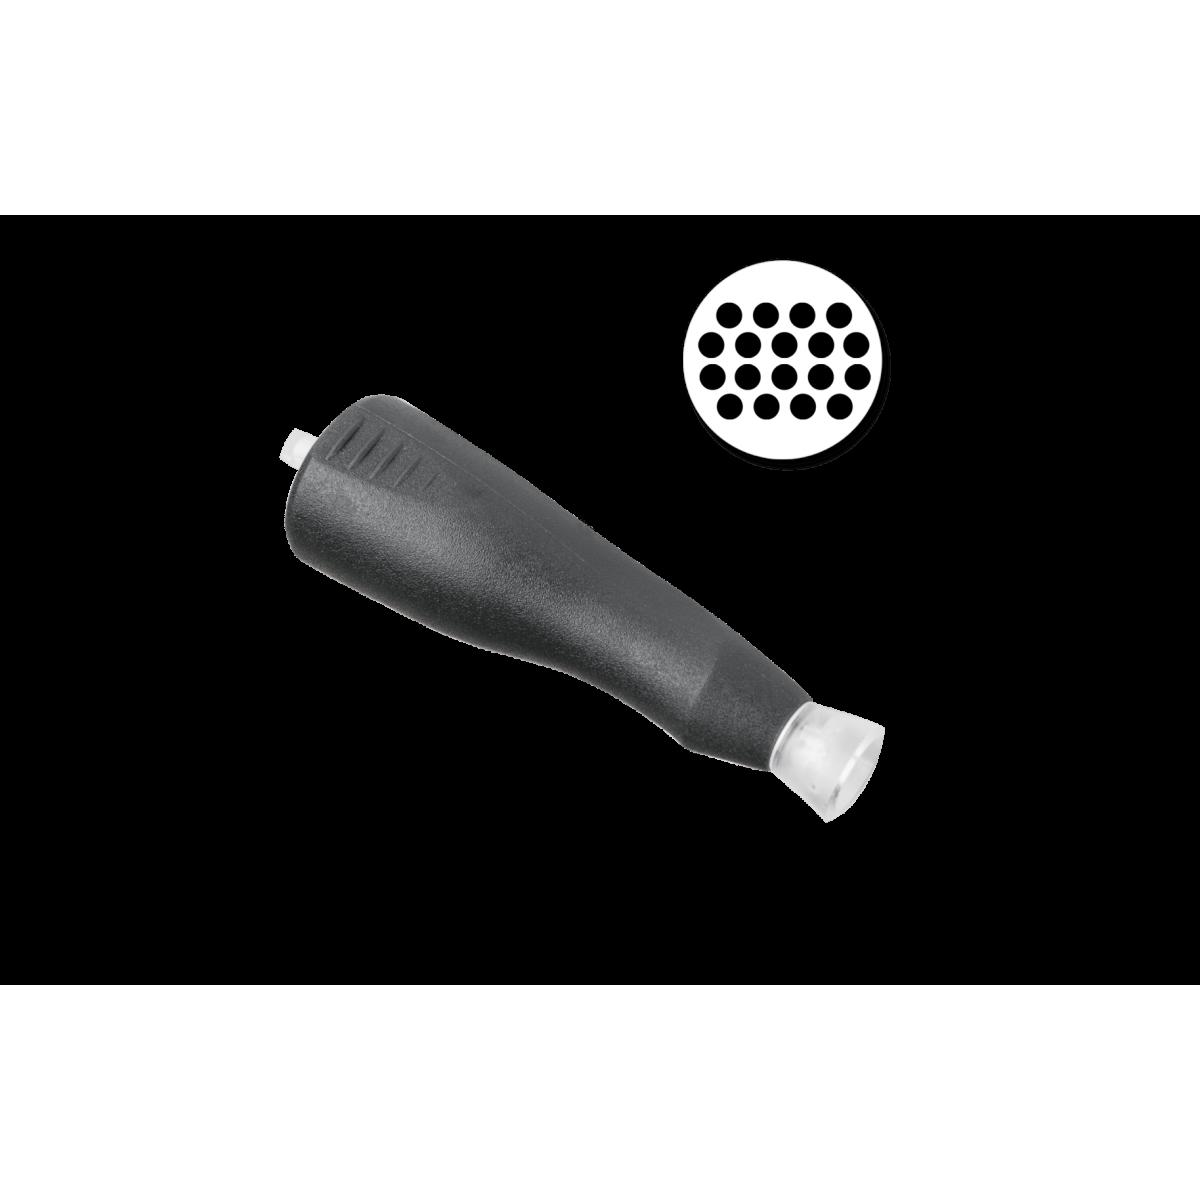 18 POINTES VYTAL PLASTIQUE (0,5 mm) EASY LINE